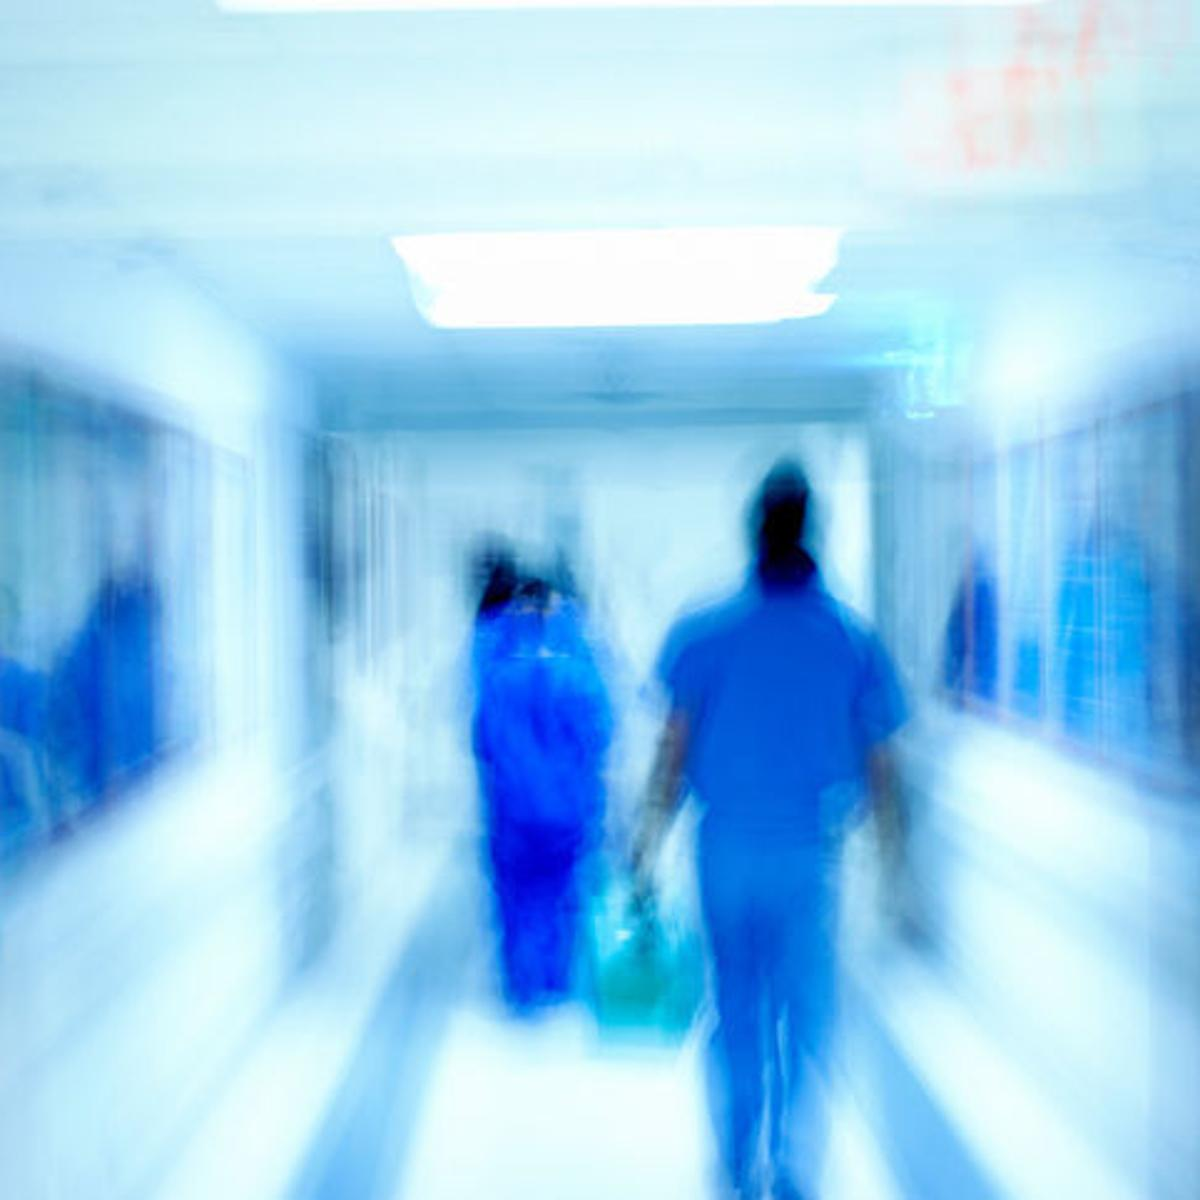 Feds investigating Kalispell hospital over doctor pay